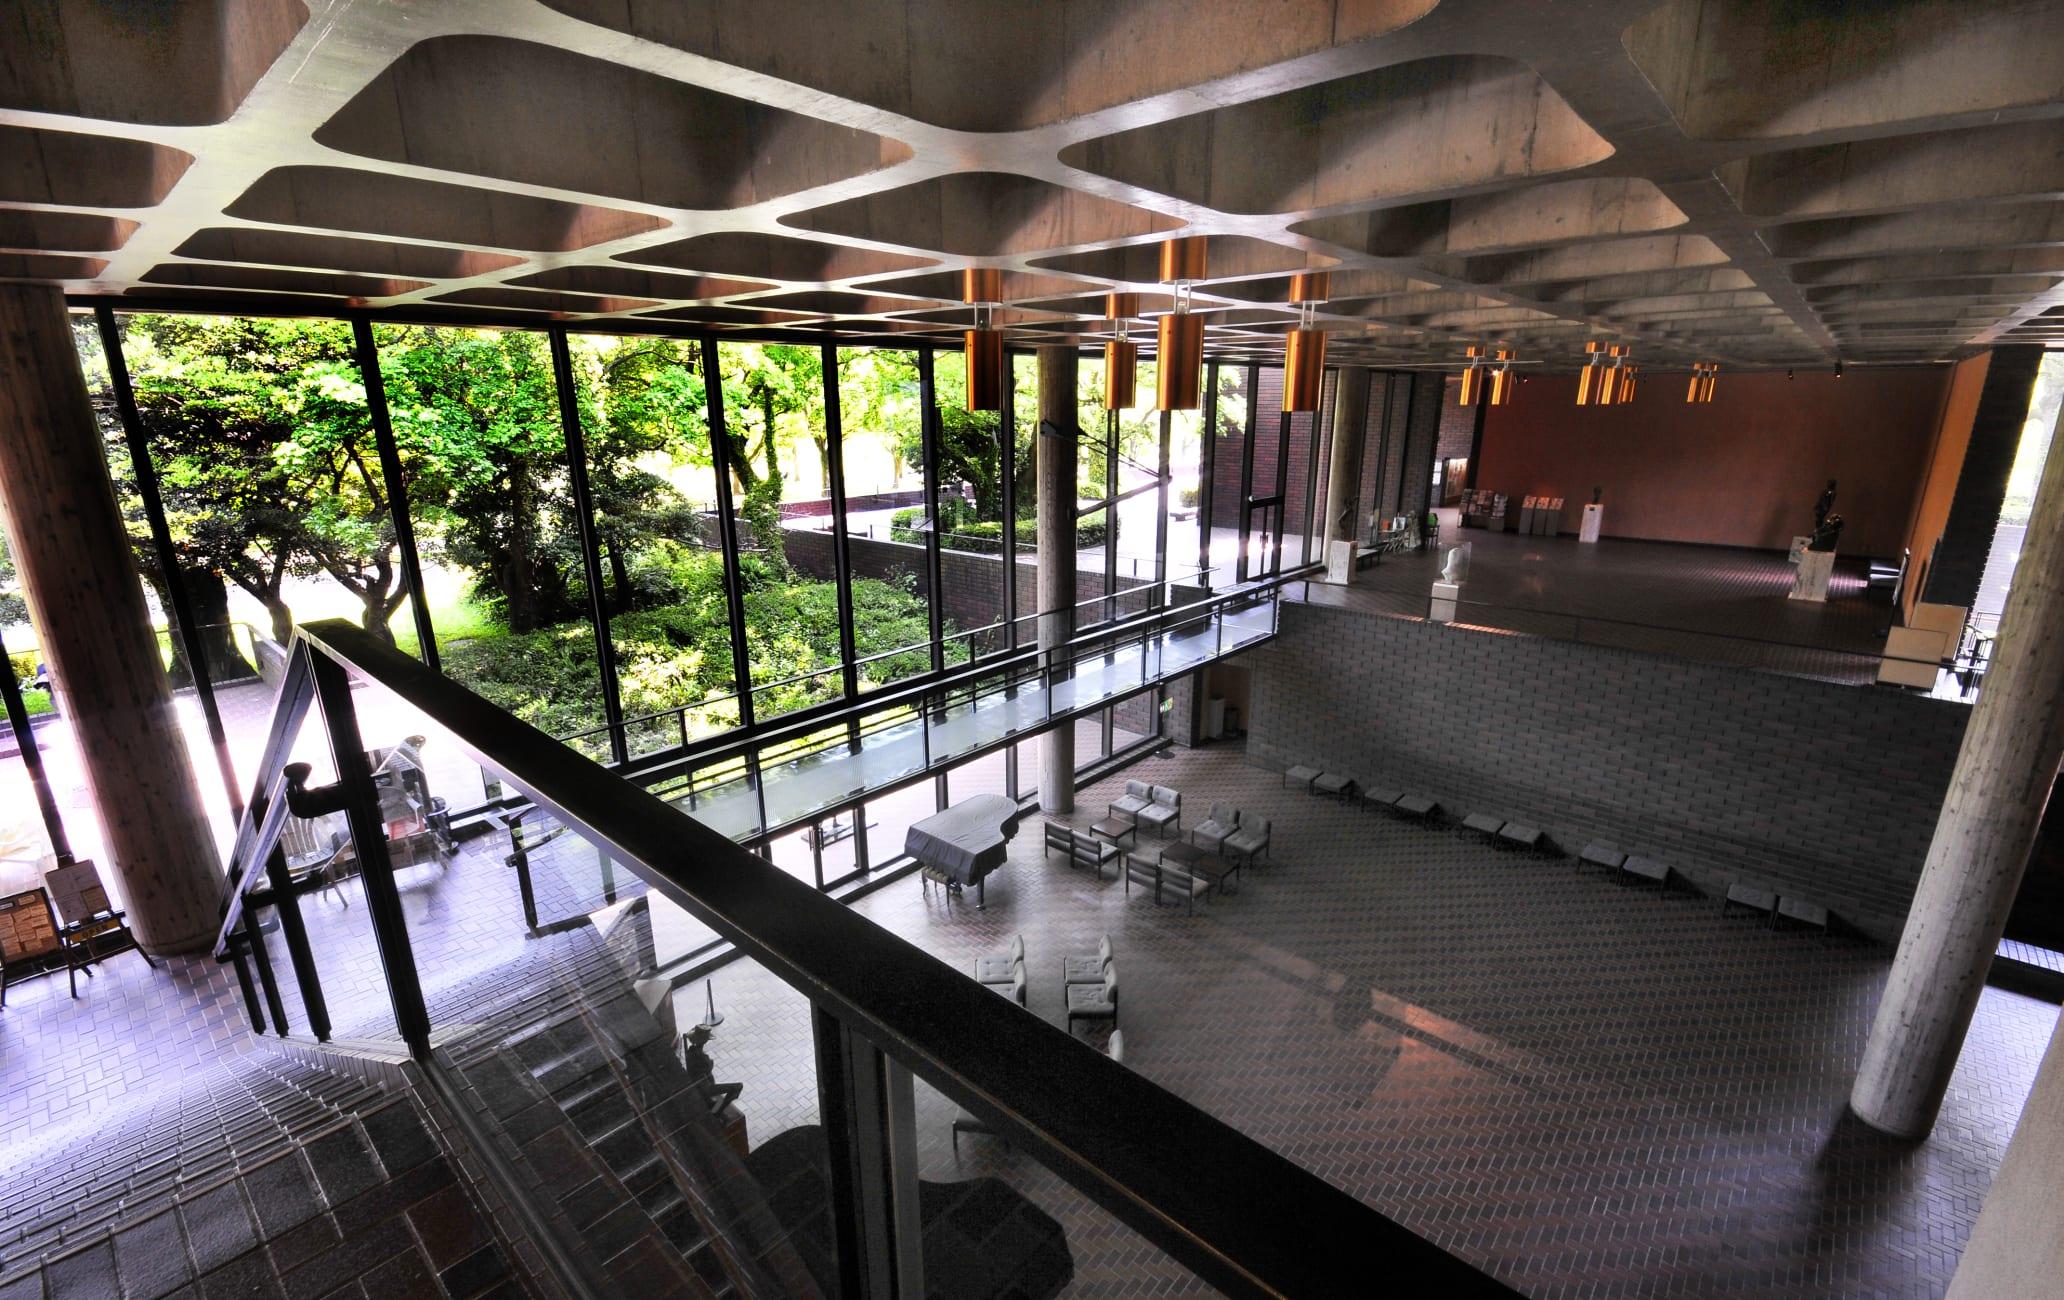 Main building of Kumamoto Kenritsu Bijutsukan Art Museum